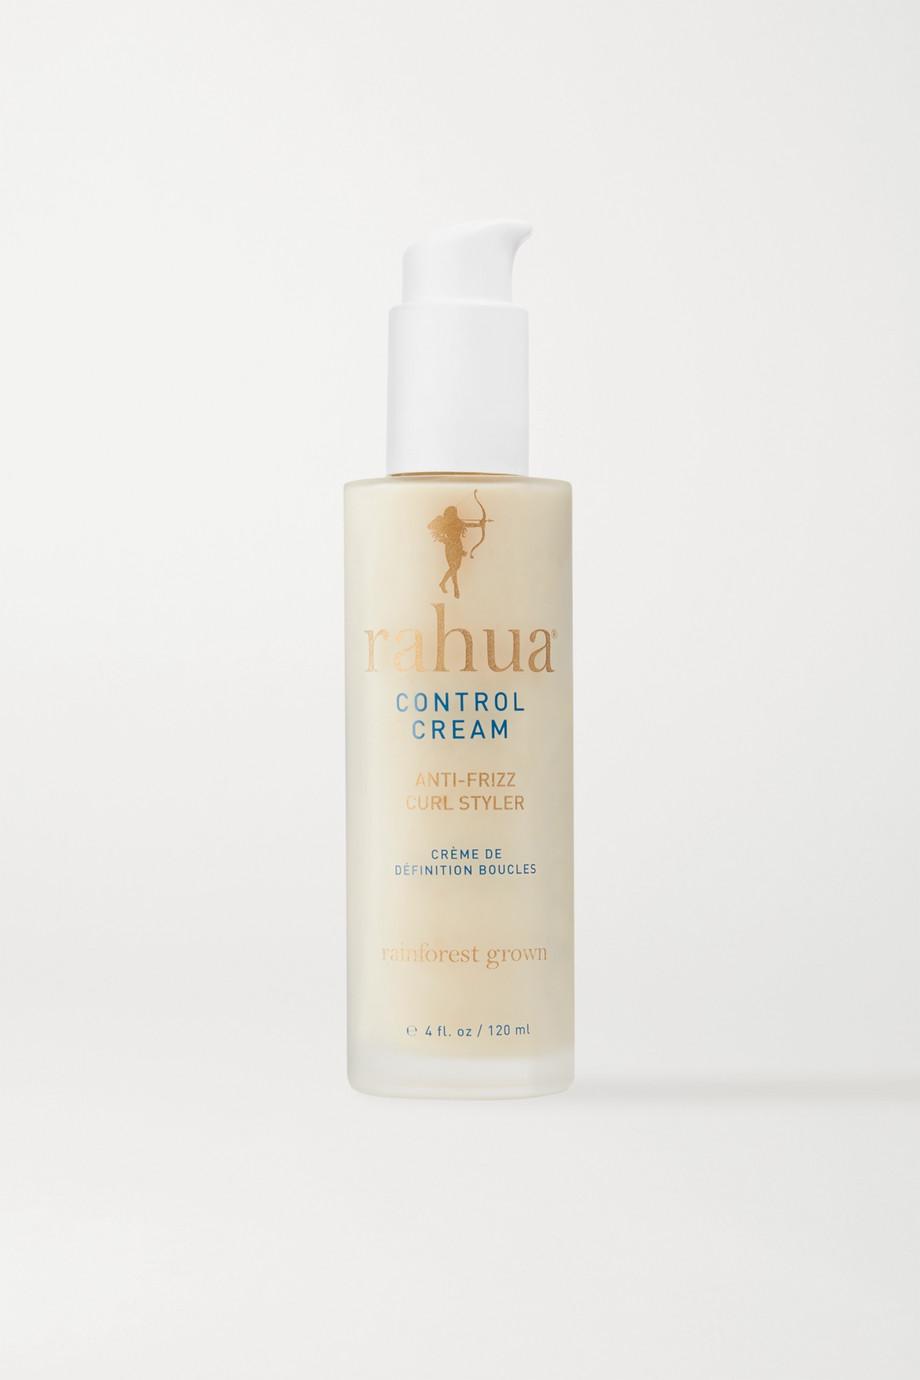 Rahua Control Cream, 120ml